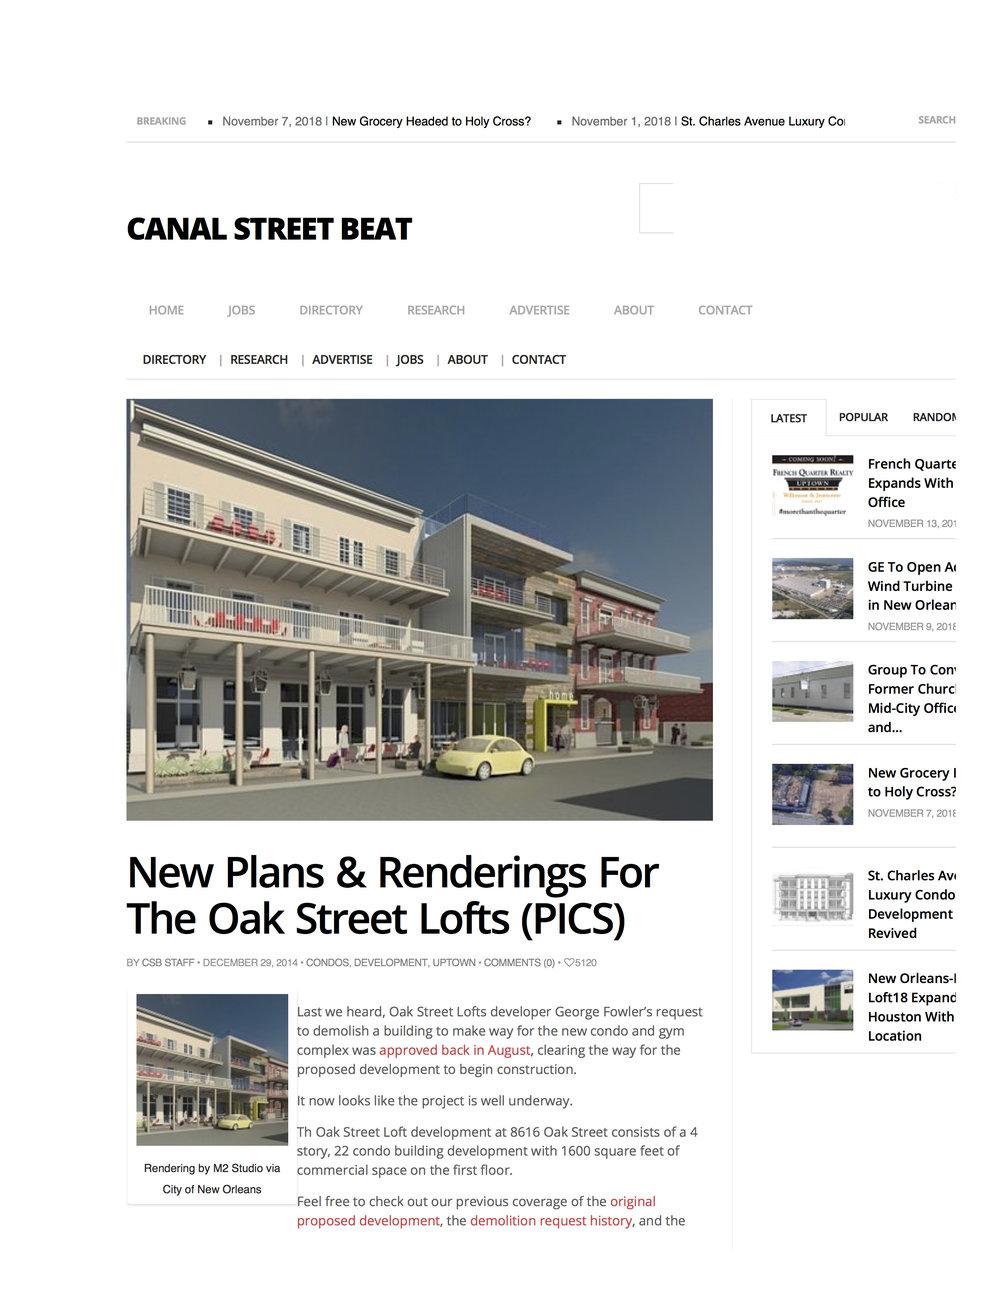 CANAL STREET BEAT | DEC 2014